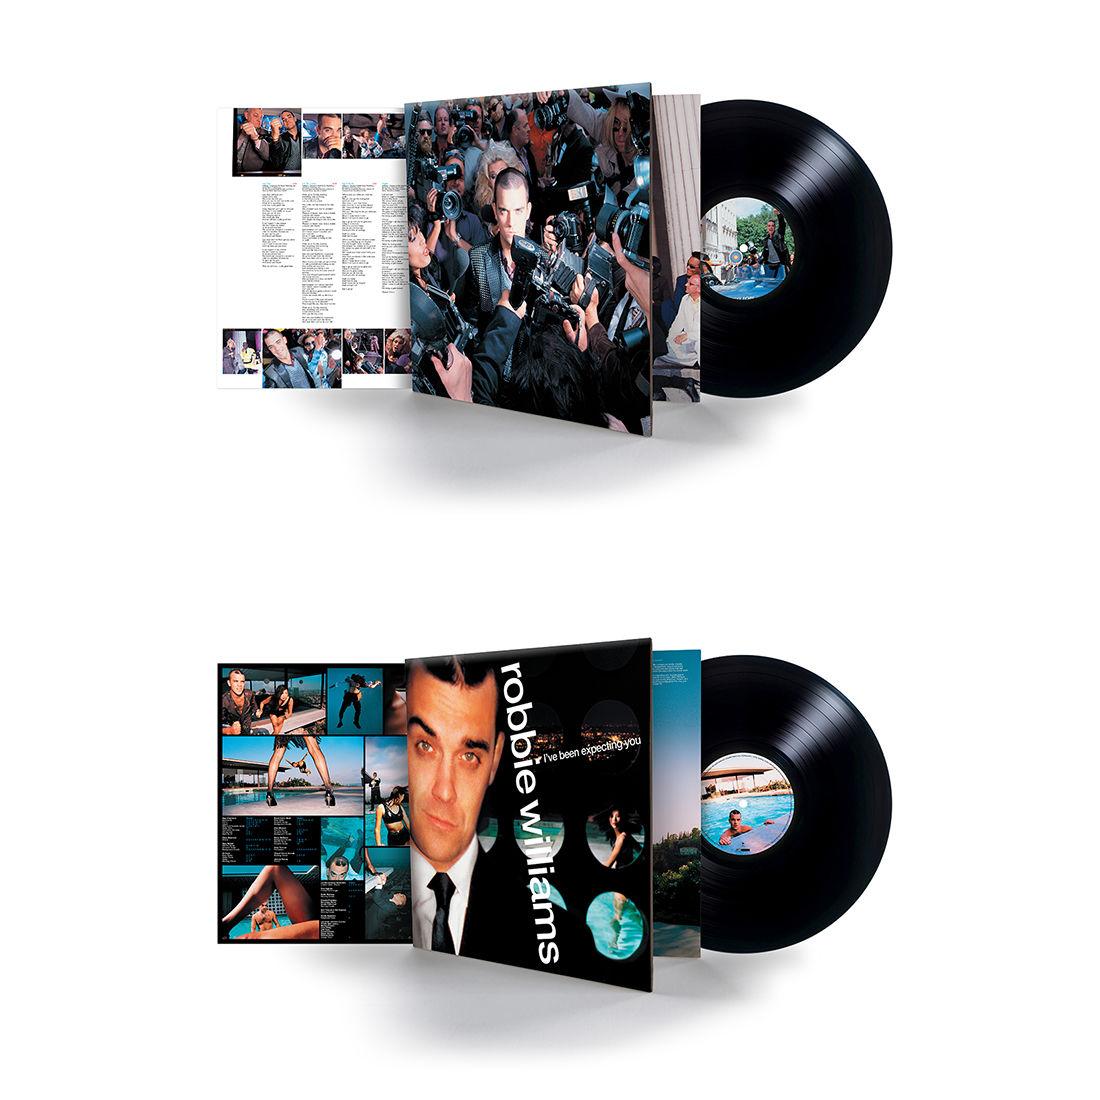 Life Thru A Lens + I've Been Expecting You Vinyl Reissue Bundle